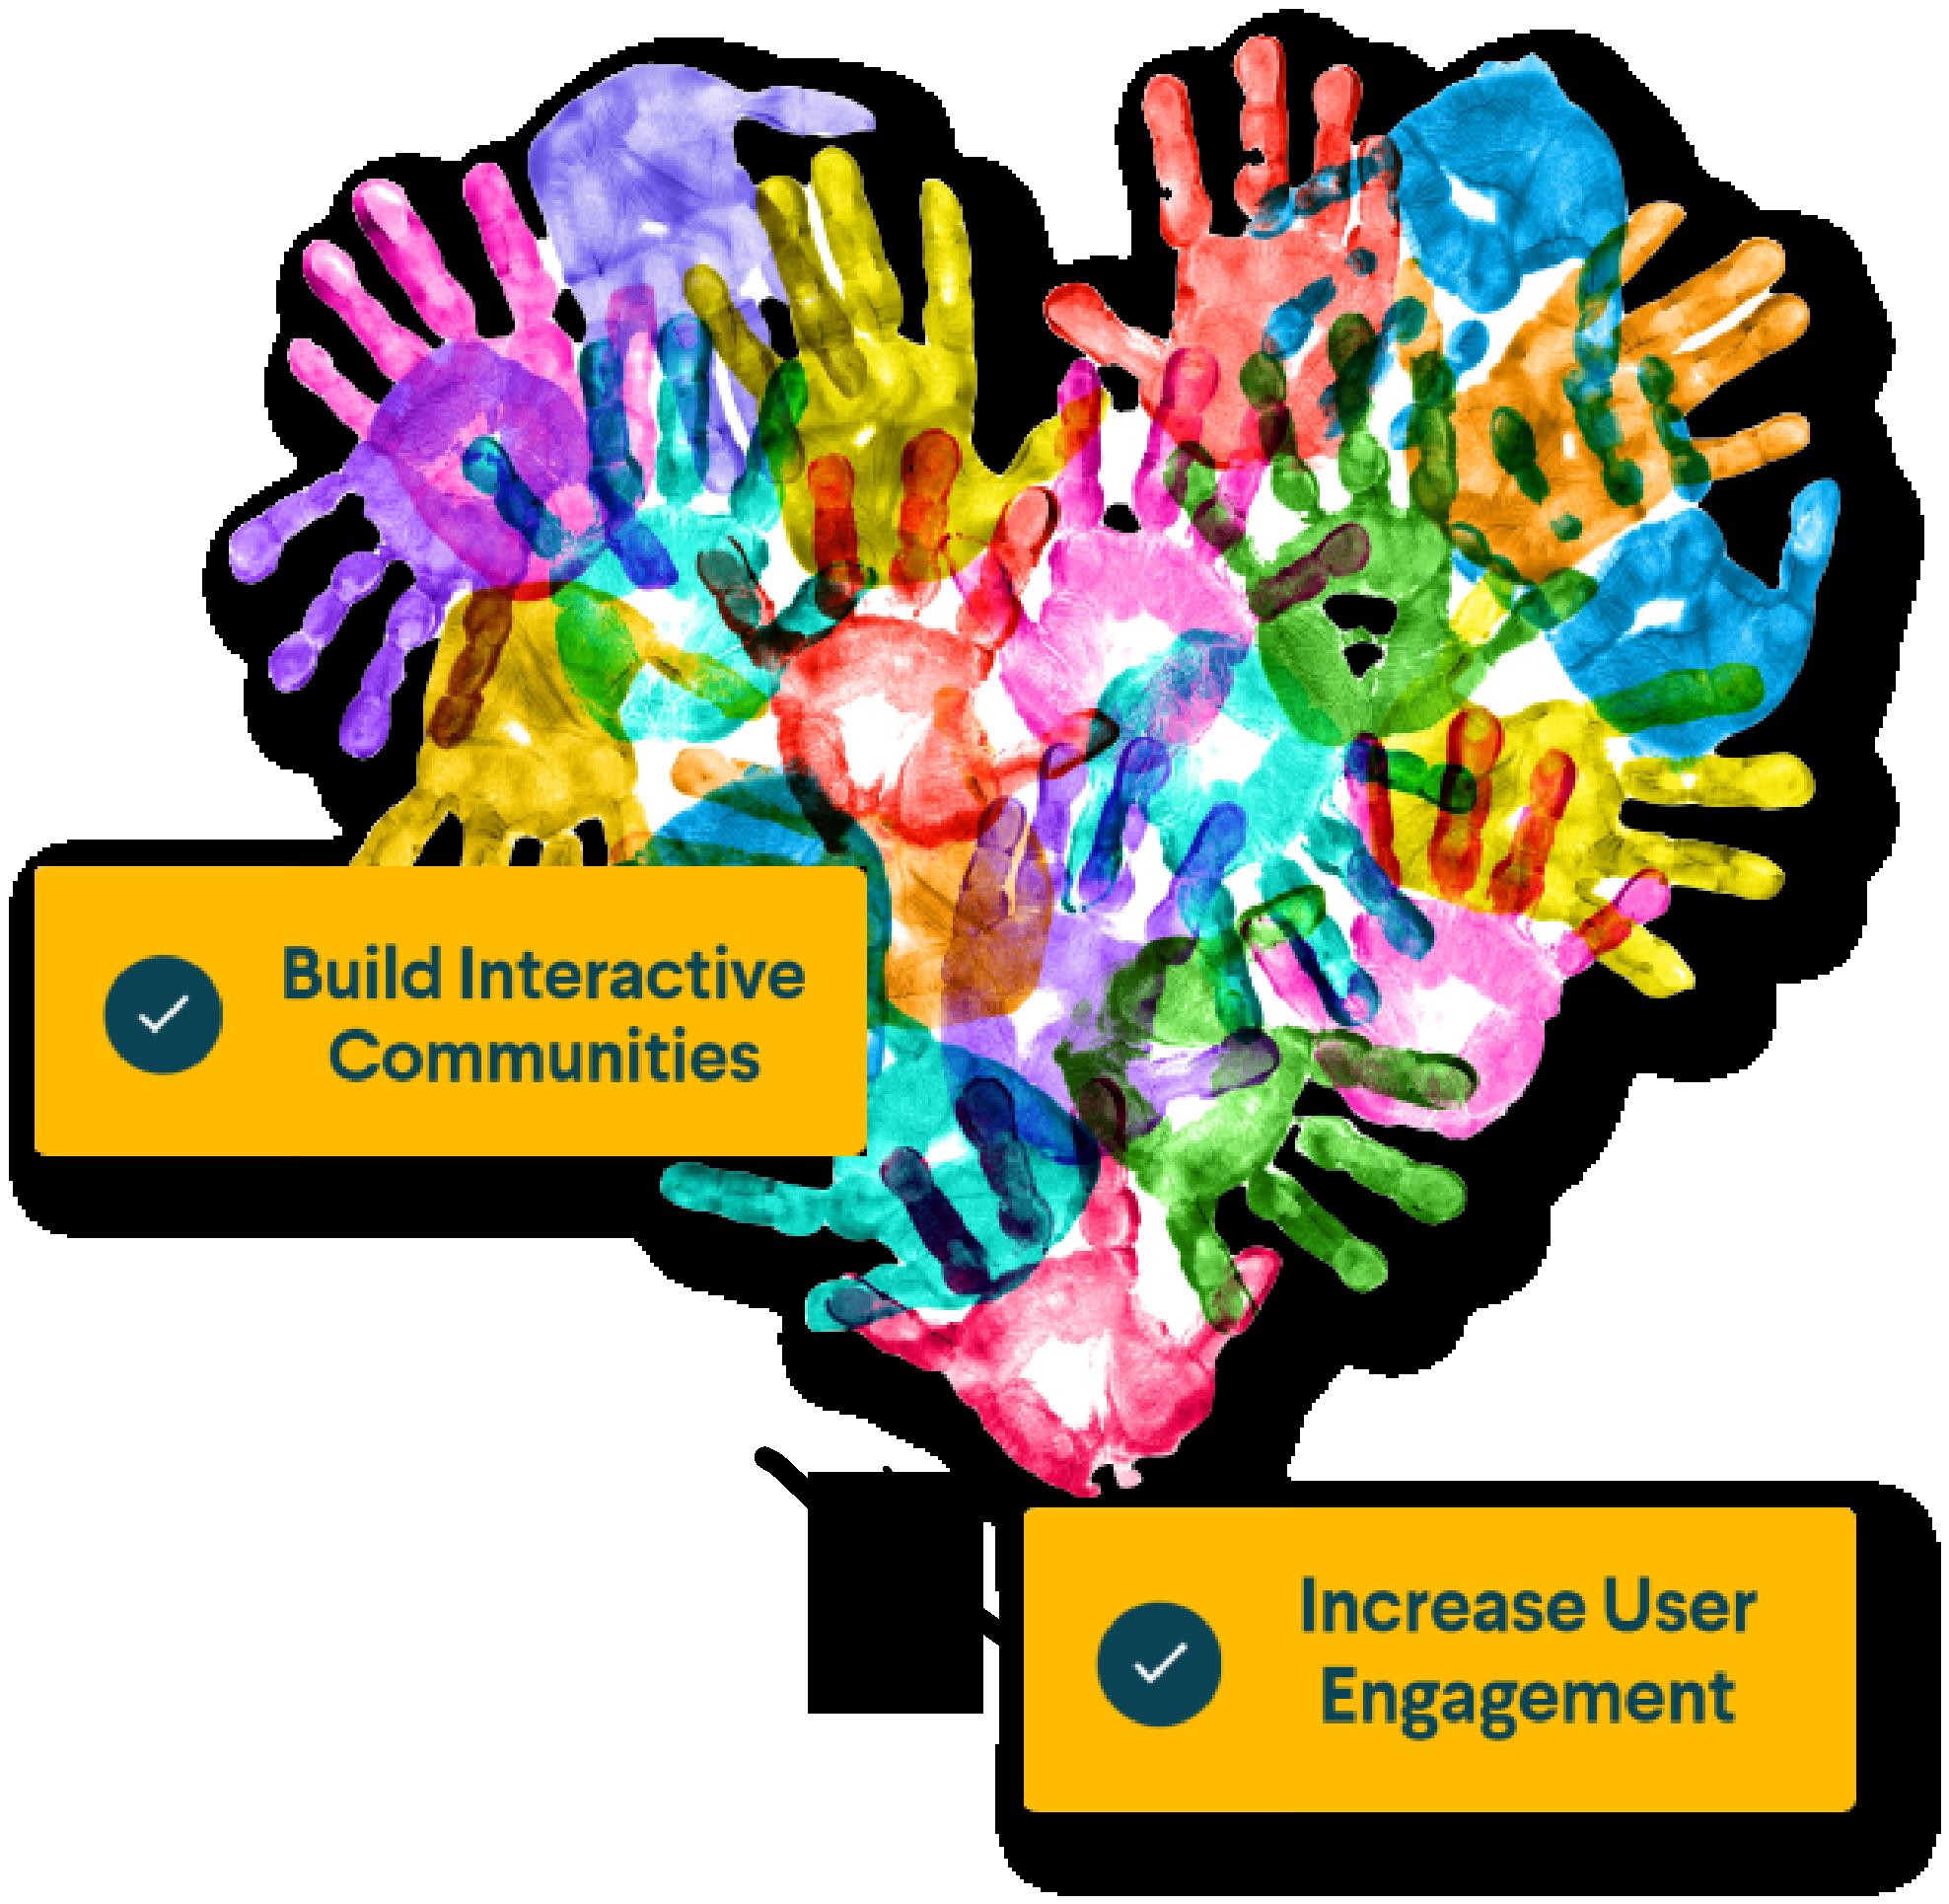 Build Interactive Communities. Increase User Engagement